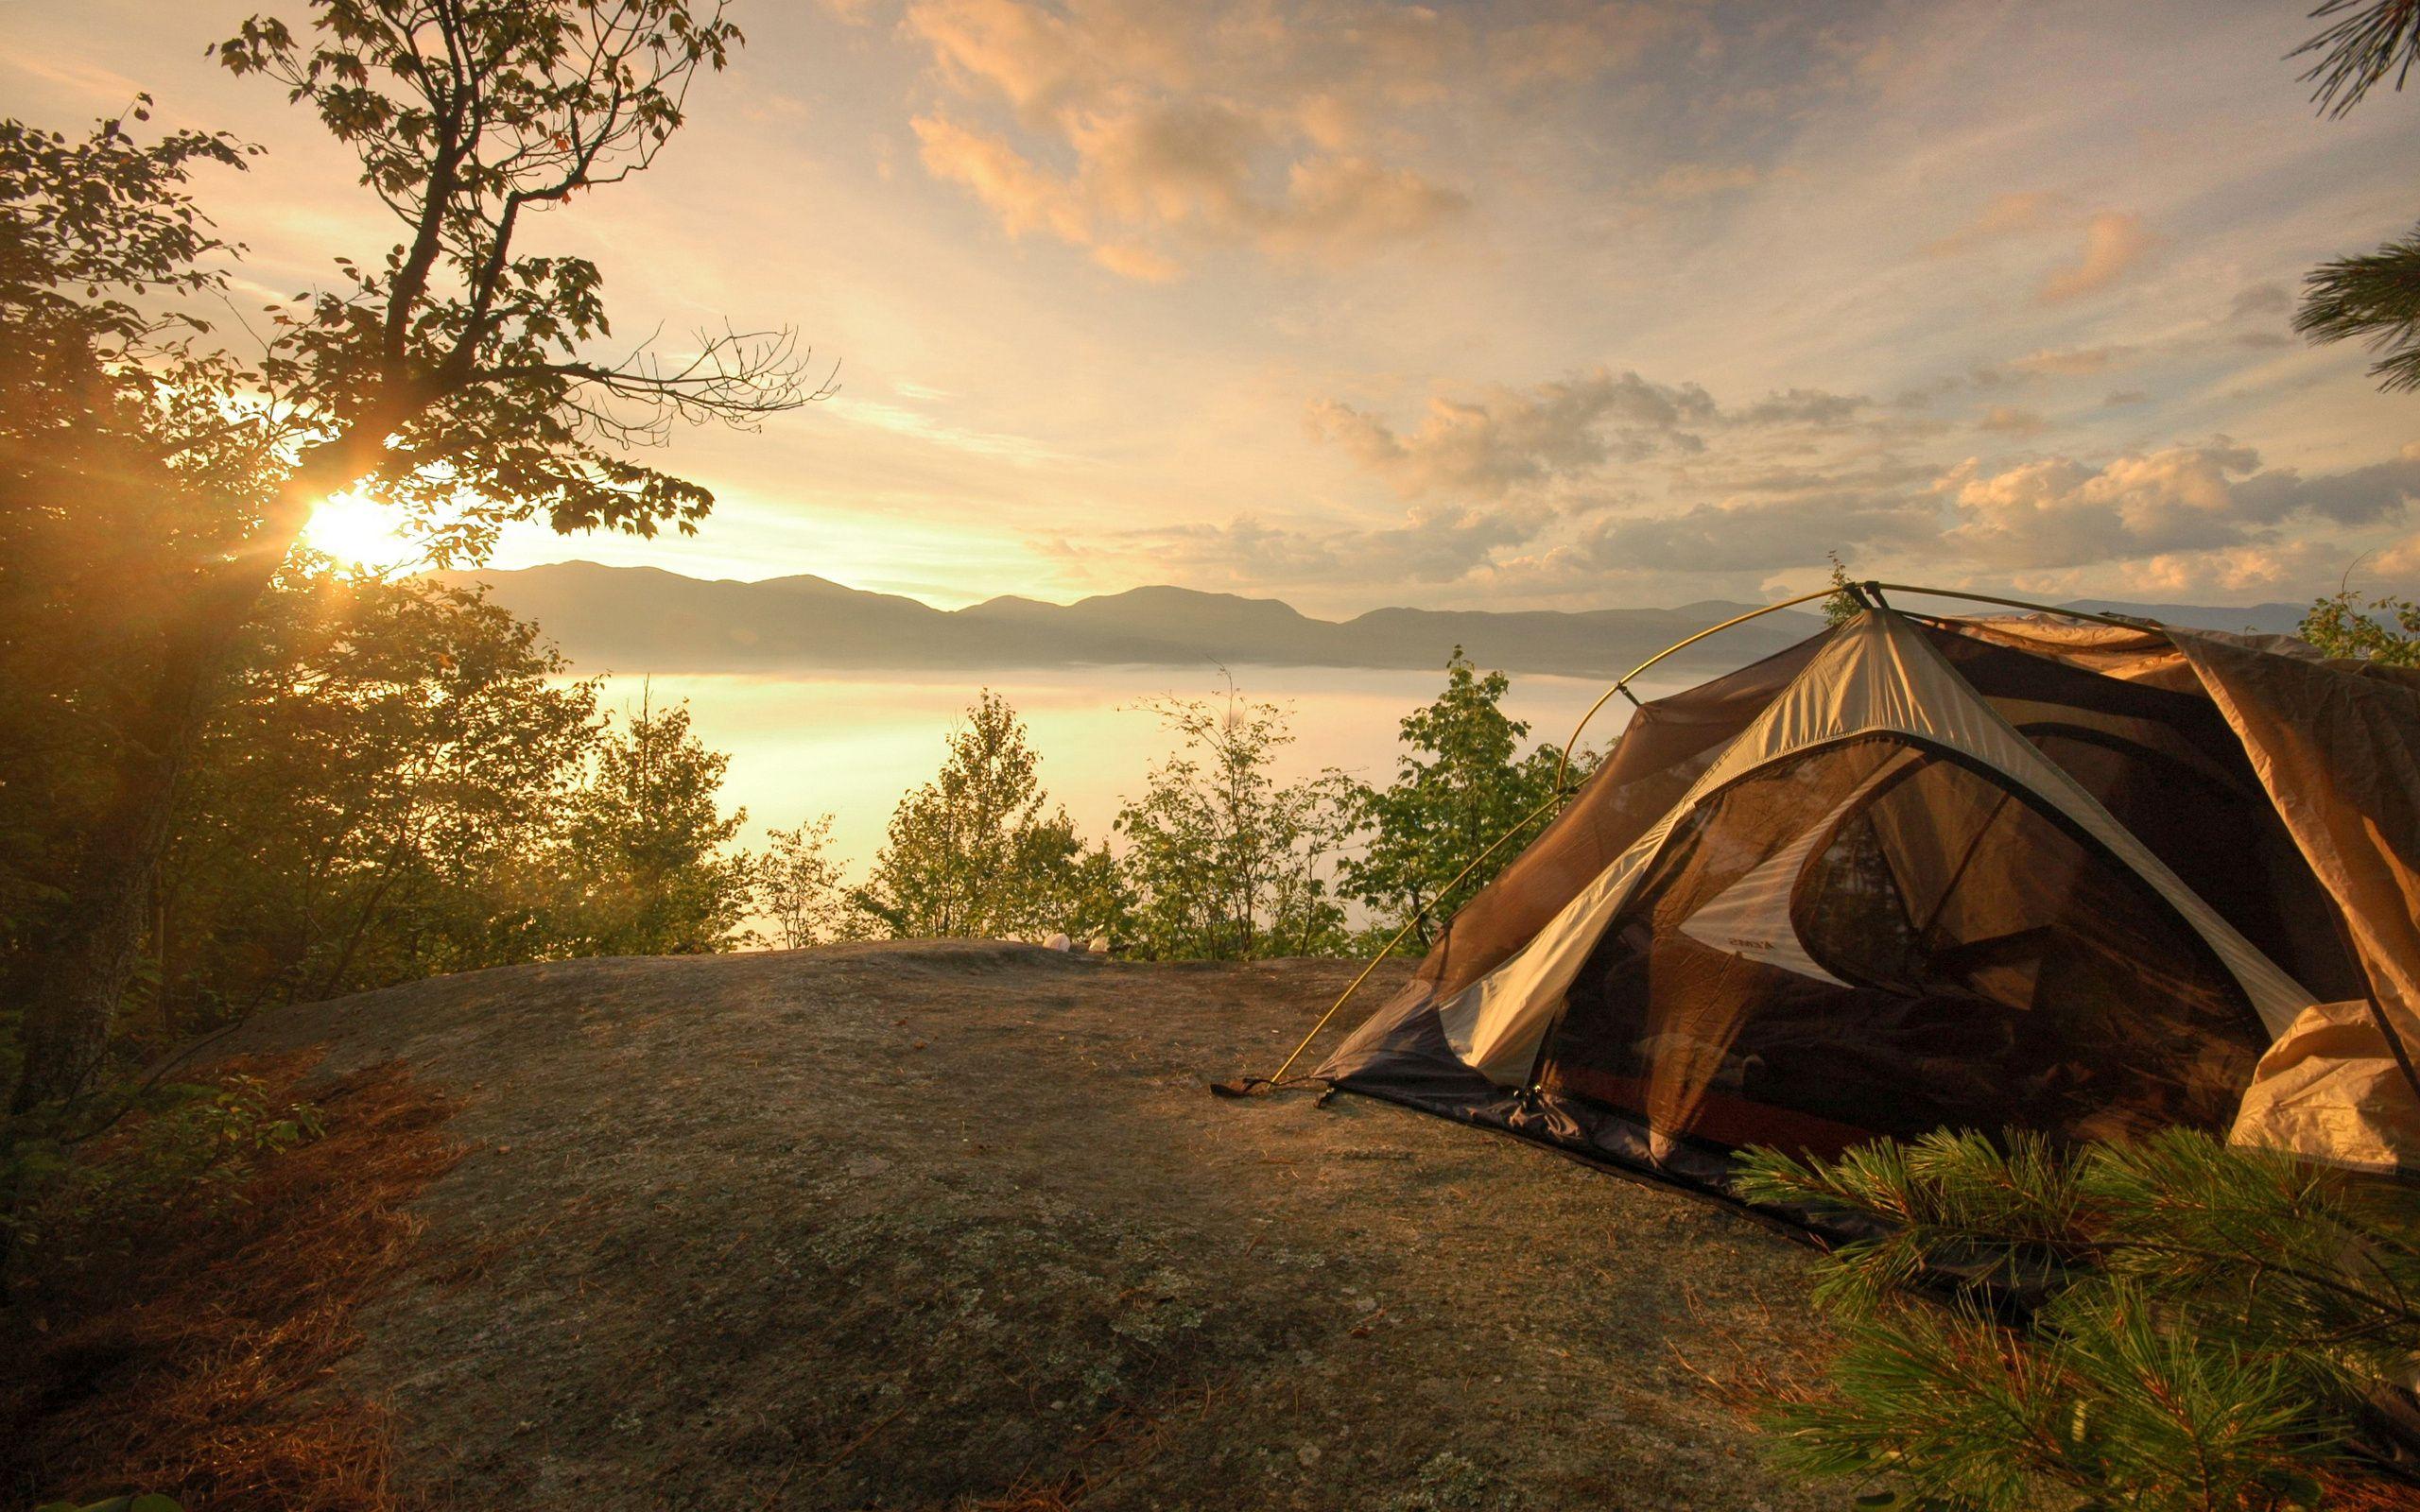 Camping Computer Wallpapers   Top Camping Computer 2560x1600